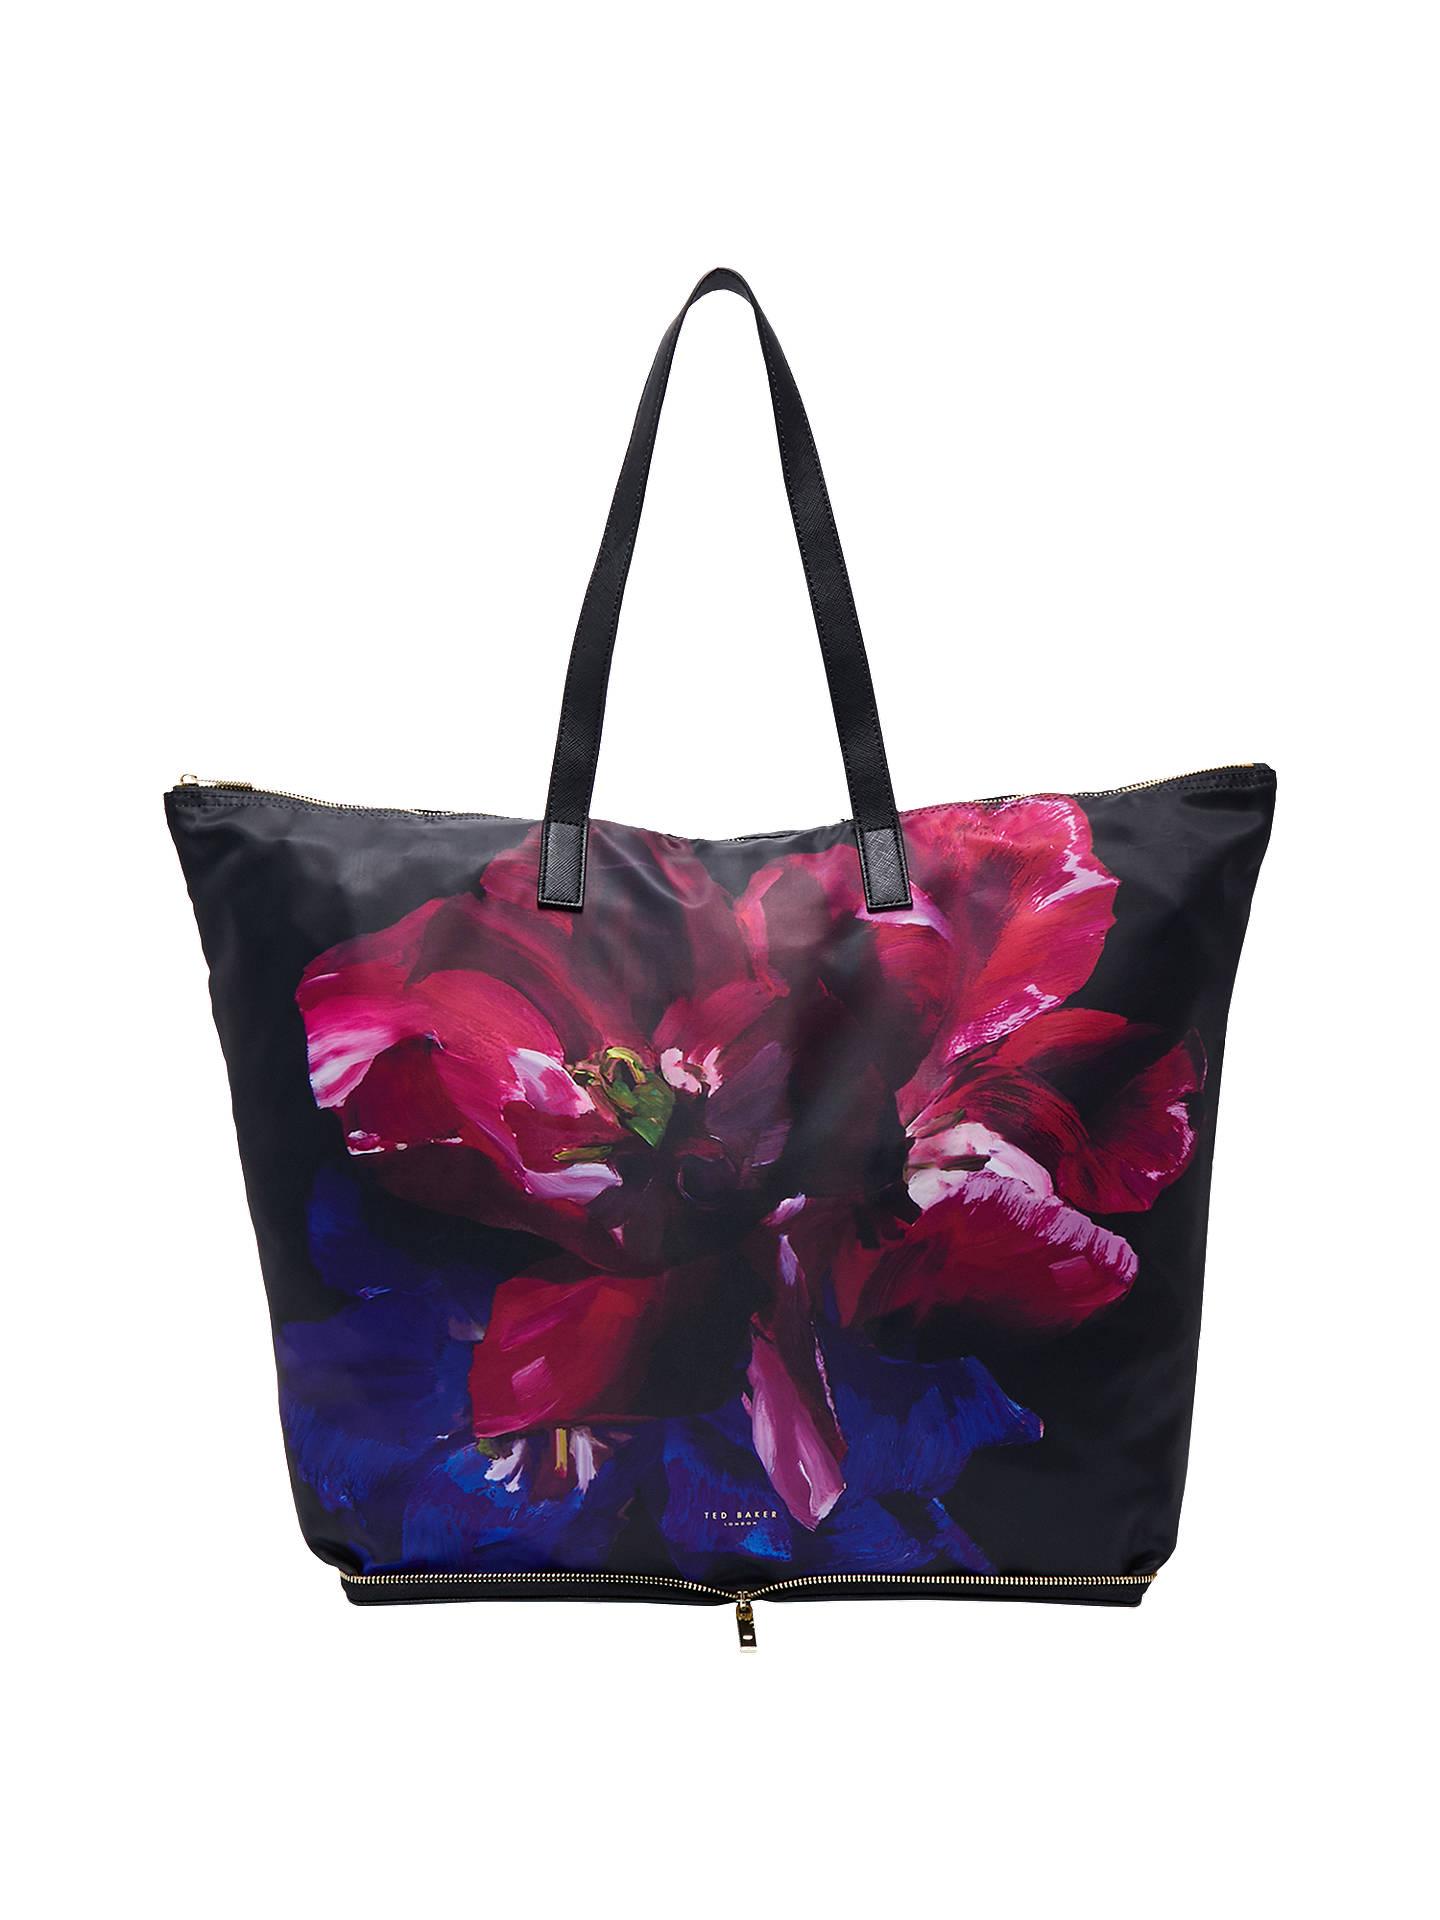 512177e12c7eb9 Buy Ted Baker Alene Impressionist Bloom Foldaway Shopper Bag